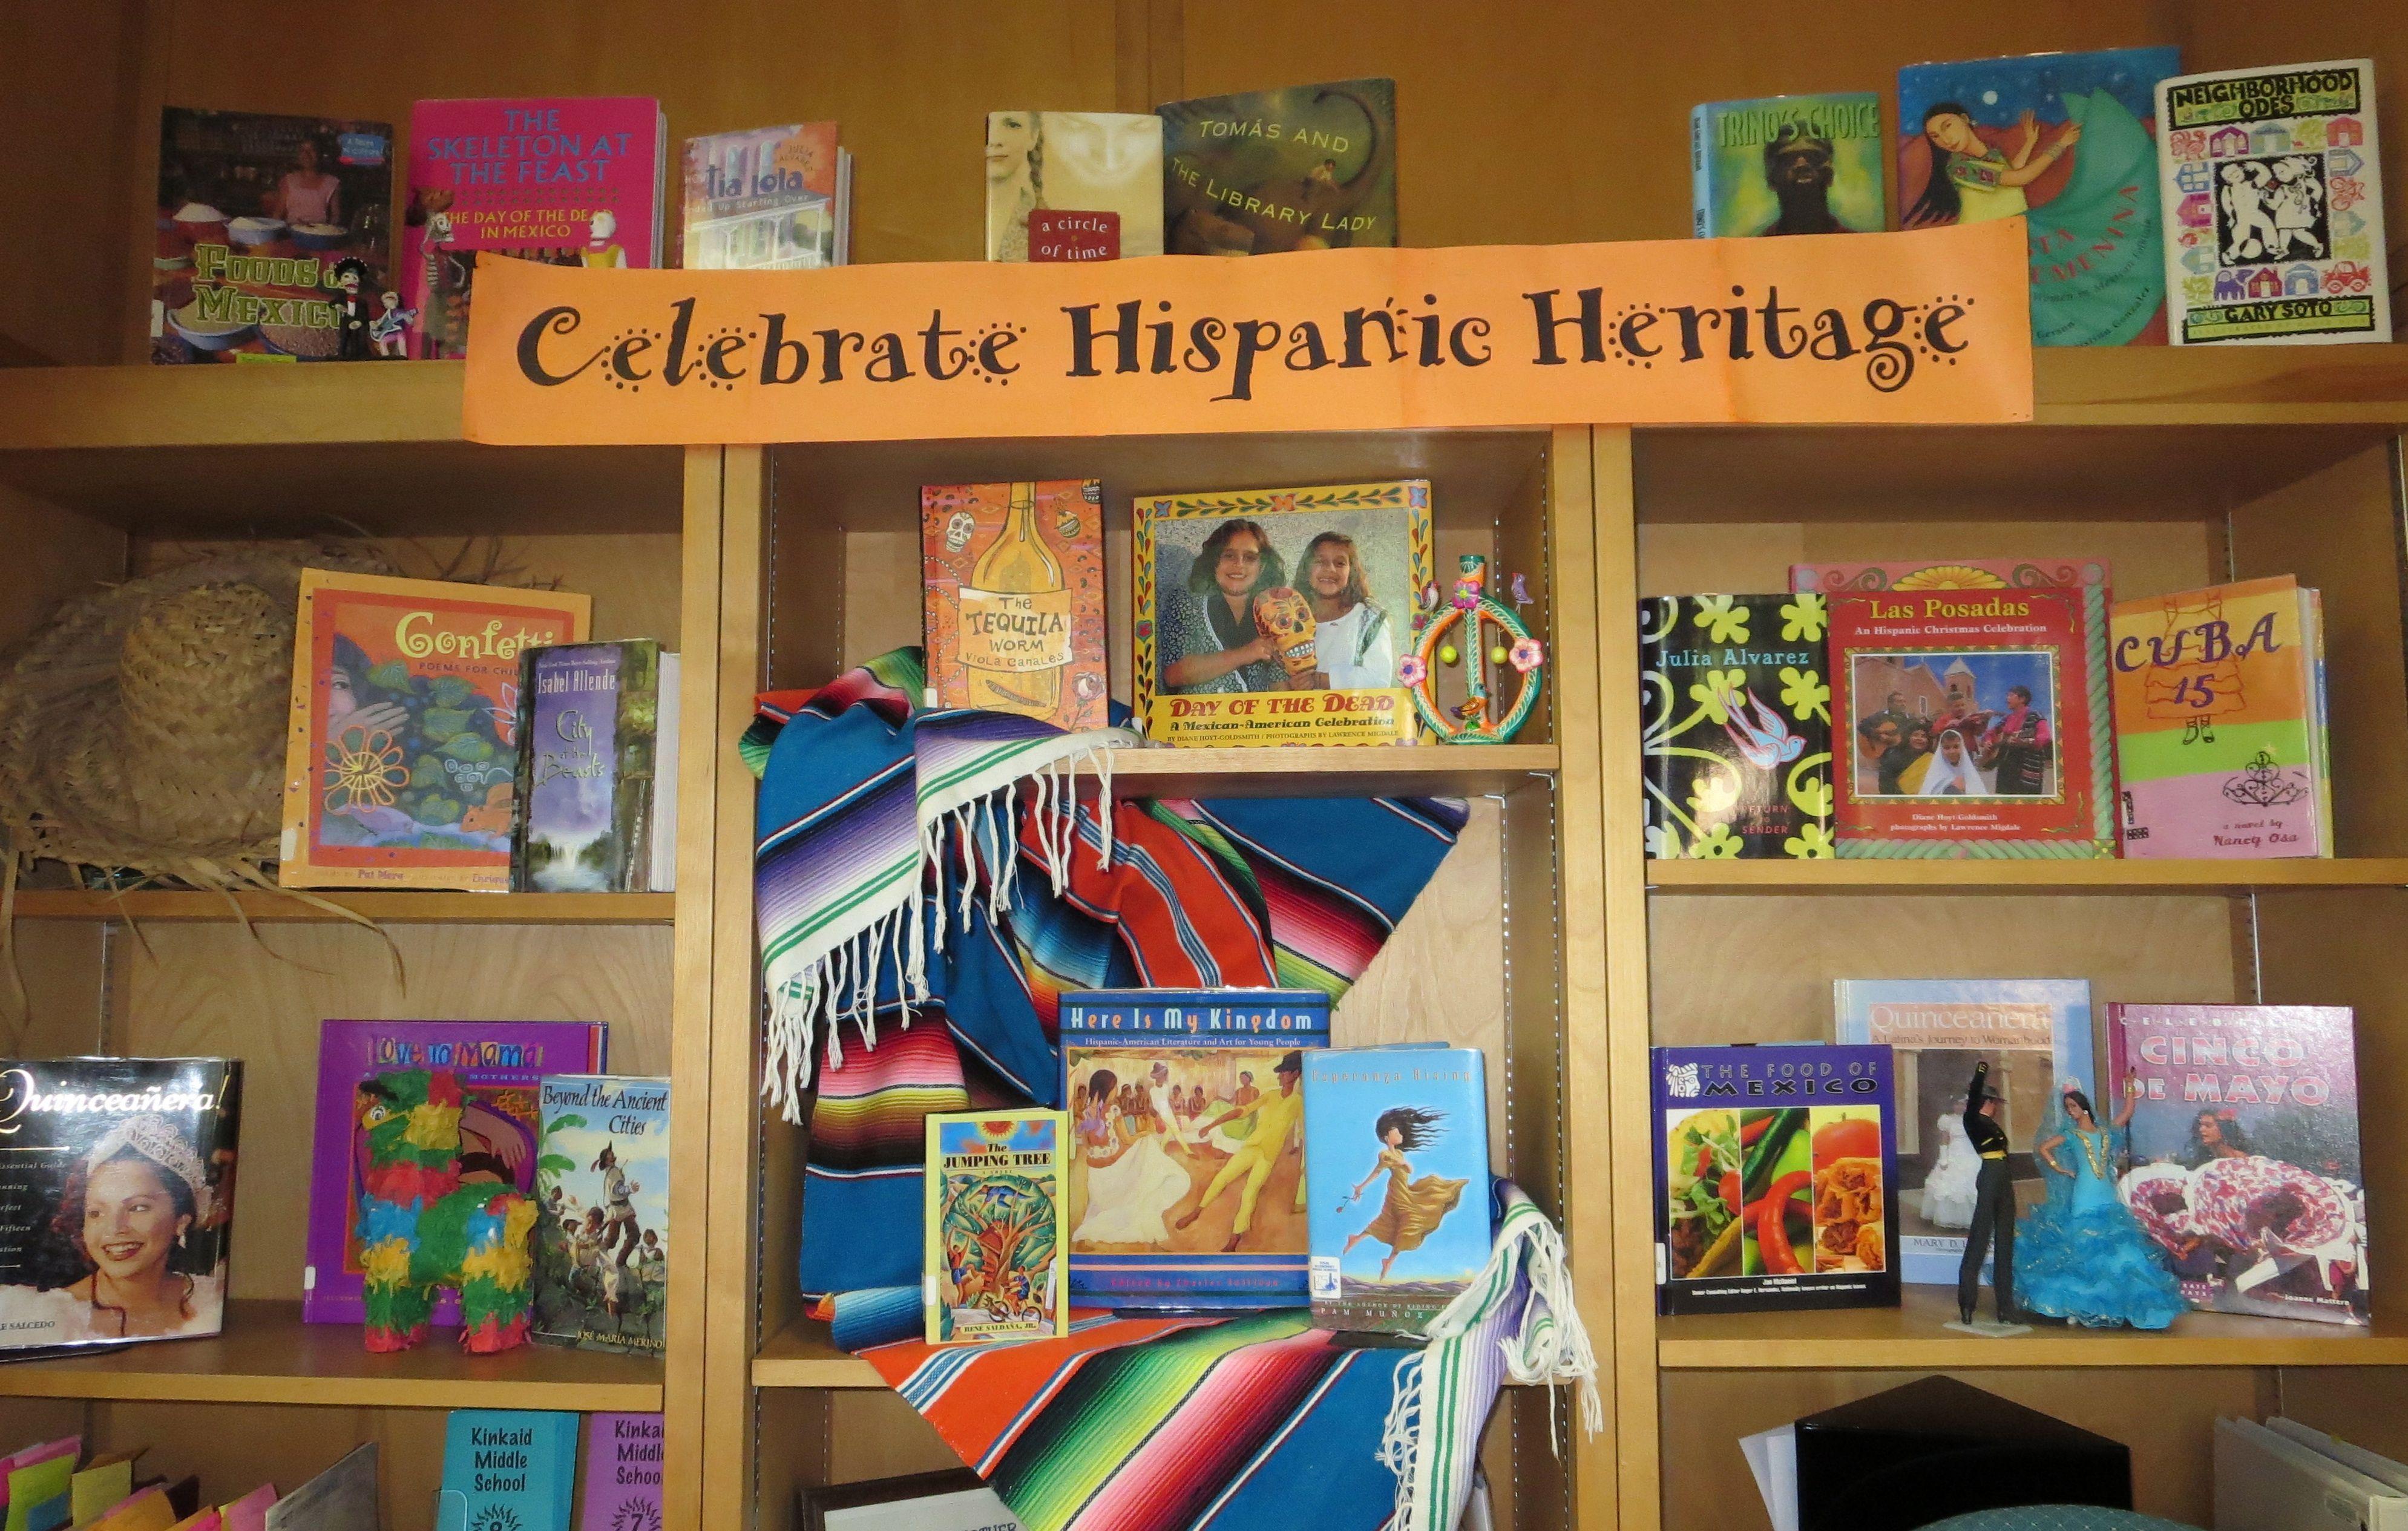 Celebrating Hispanic Heritage Month With Images